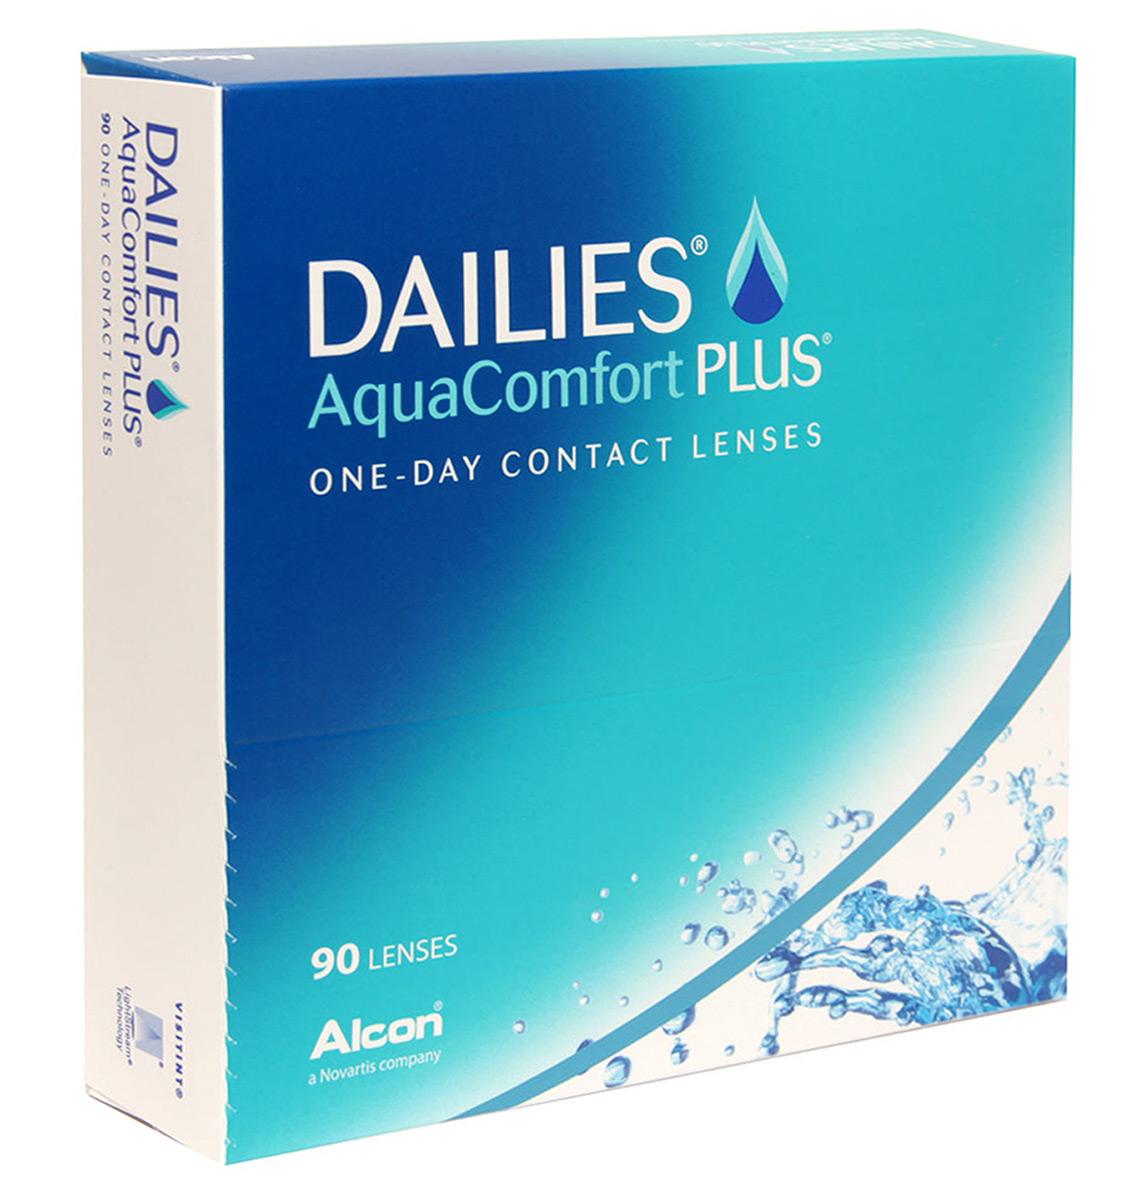 Alcon-CIBA Vision контактные линзы Dailies AquaComfort Plus (90шт / 8.7 / 14.0 / +0.75)